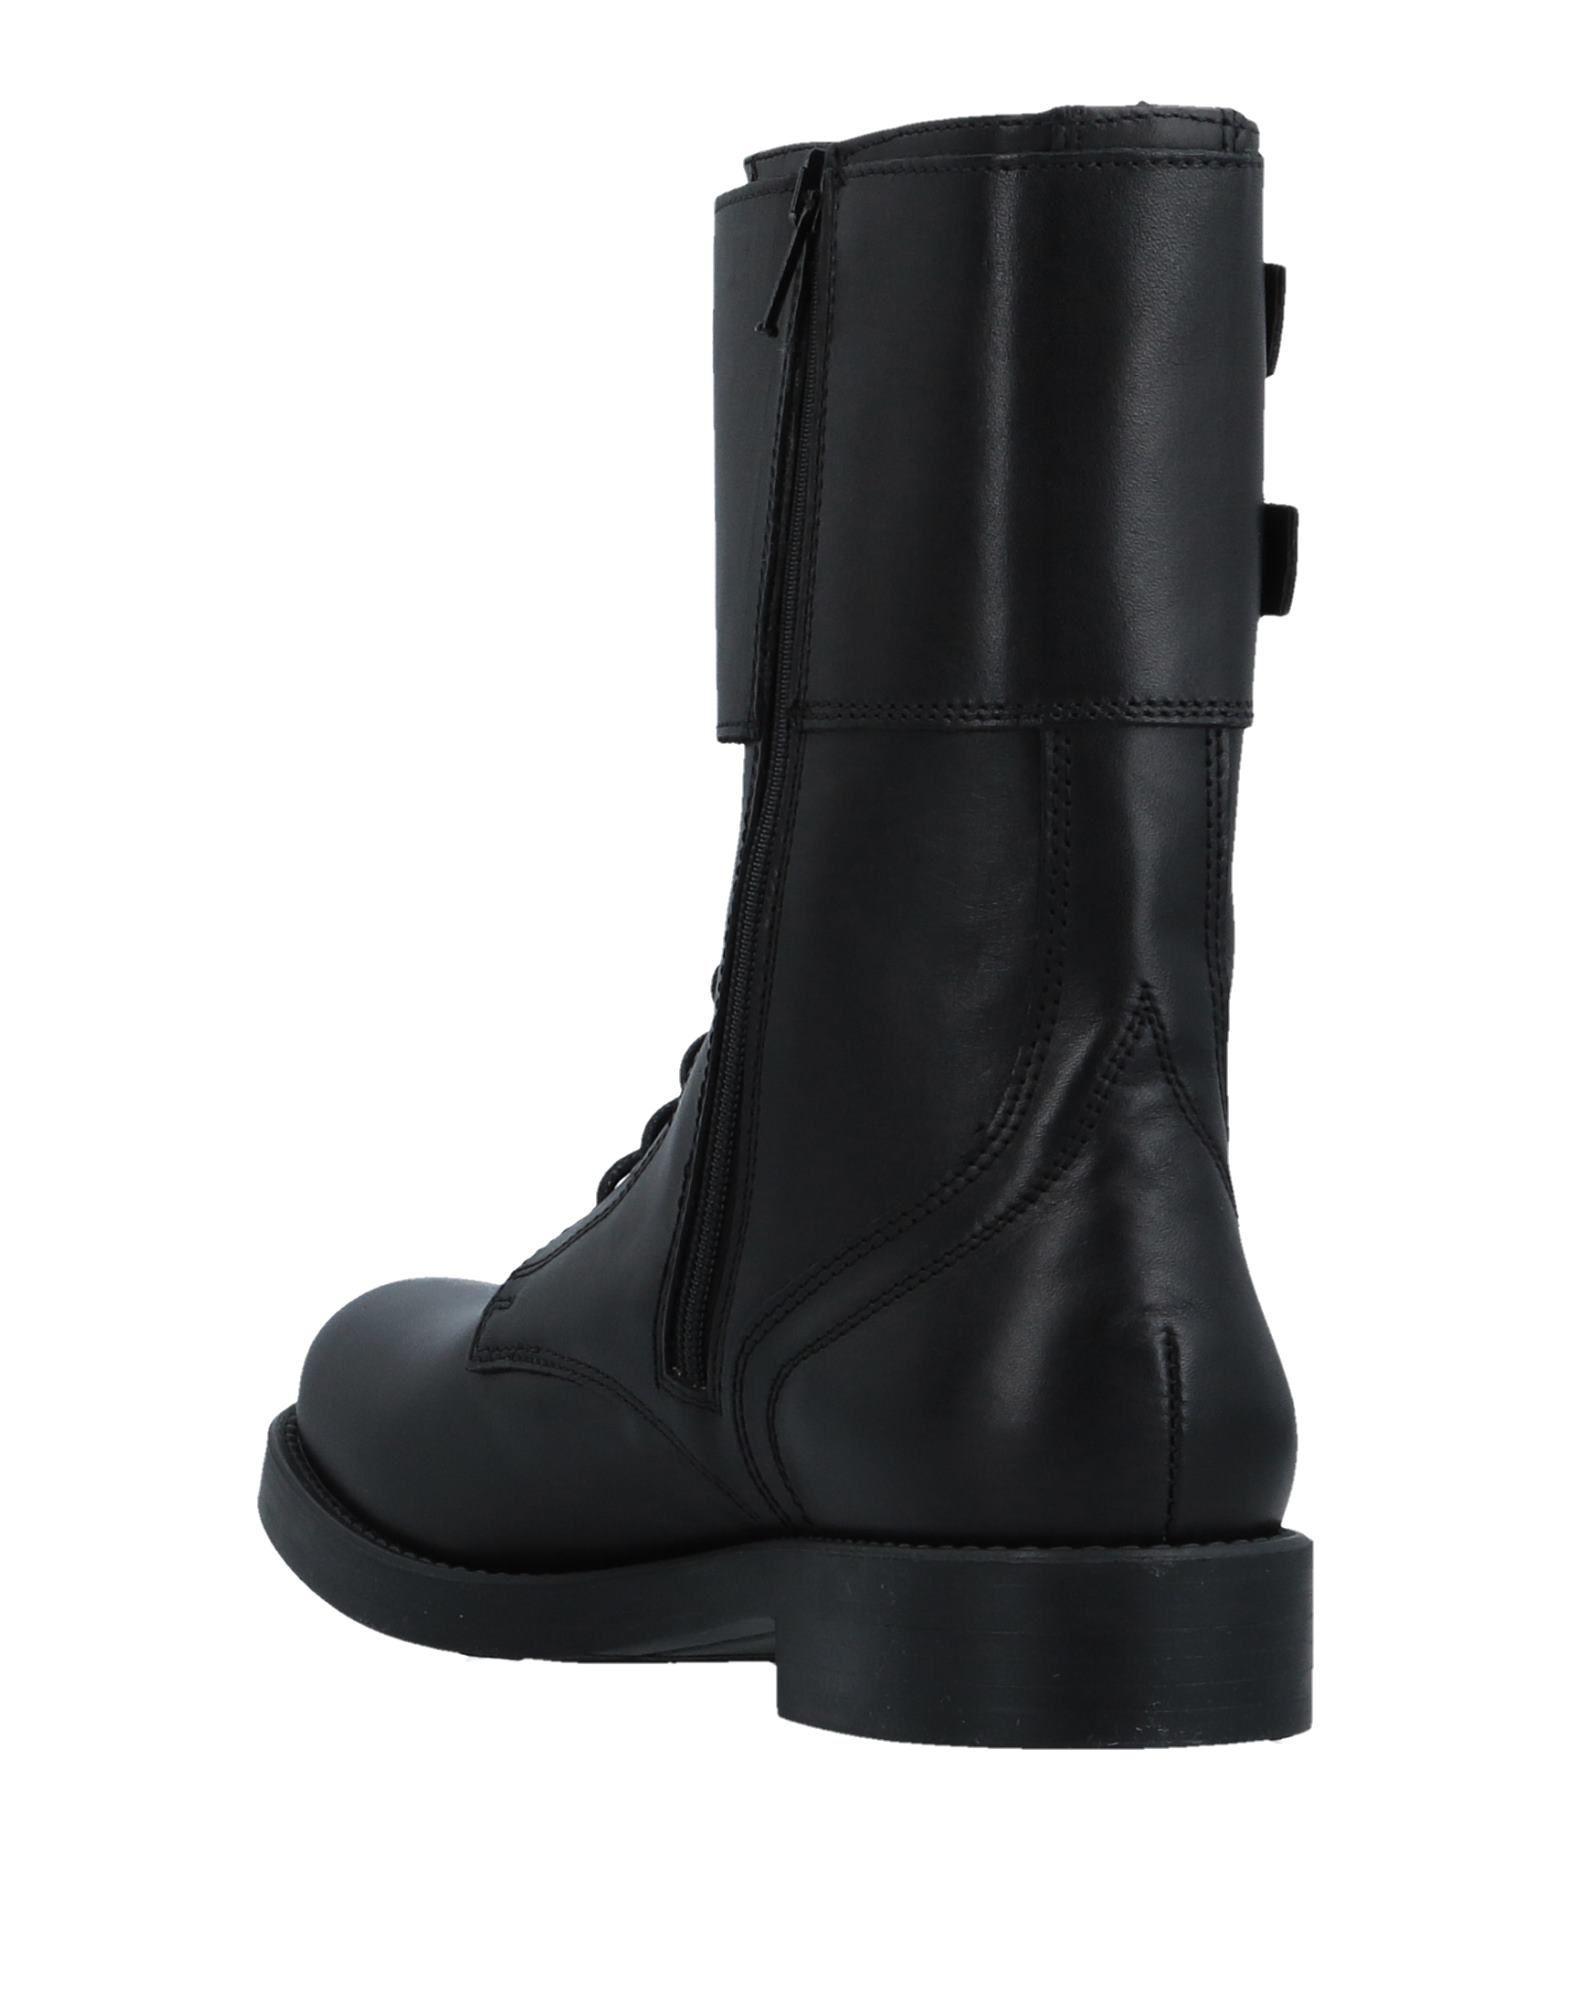 Chaussures - Bottines Sachet 6IeF64